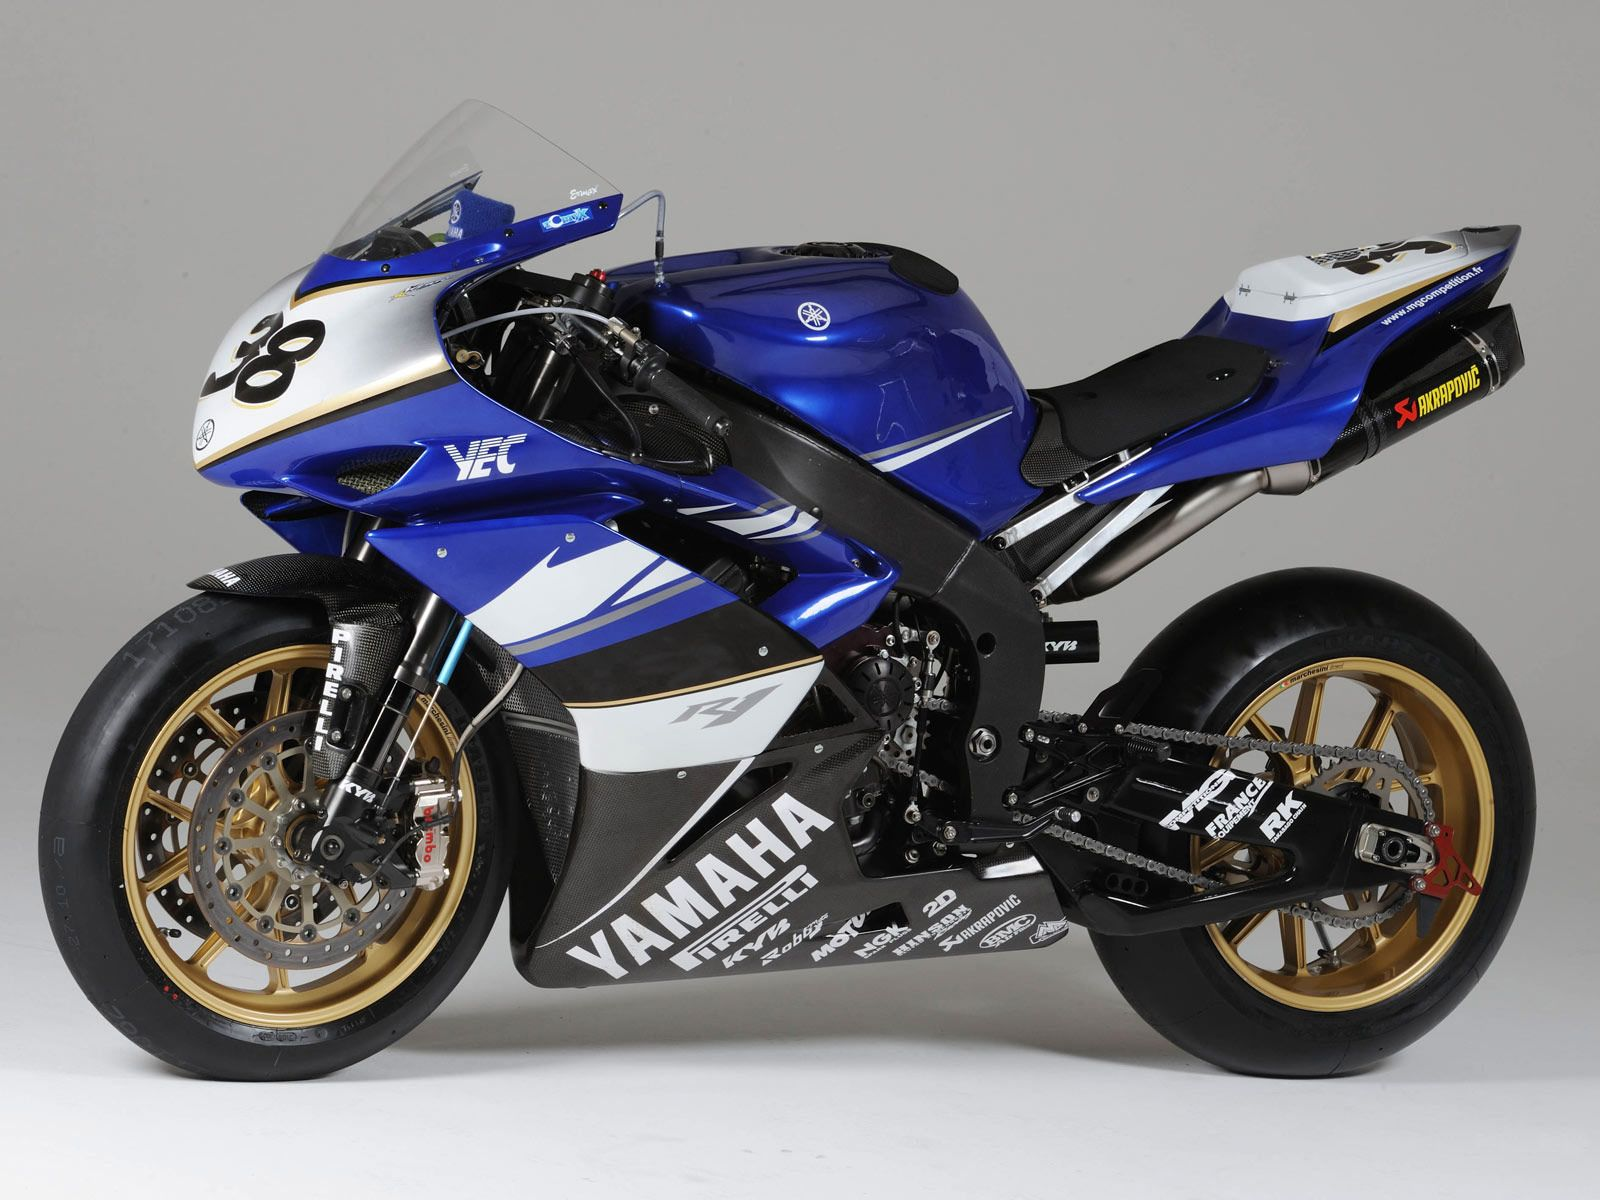 2012 yamaha yzf r6 reviews prices and specs review ebooks - M S De 25 Ideas Incre Bles Sobre Yamaha Modelo Yzf R1 En Pinterest Yamaha R1 Bicicletas Deportivas Y Honda Cbr 1000rr